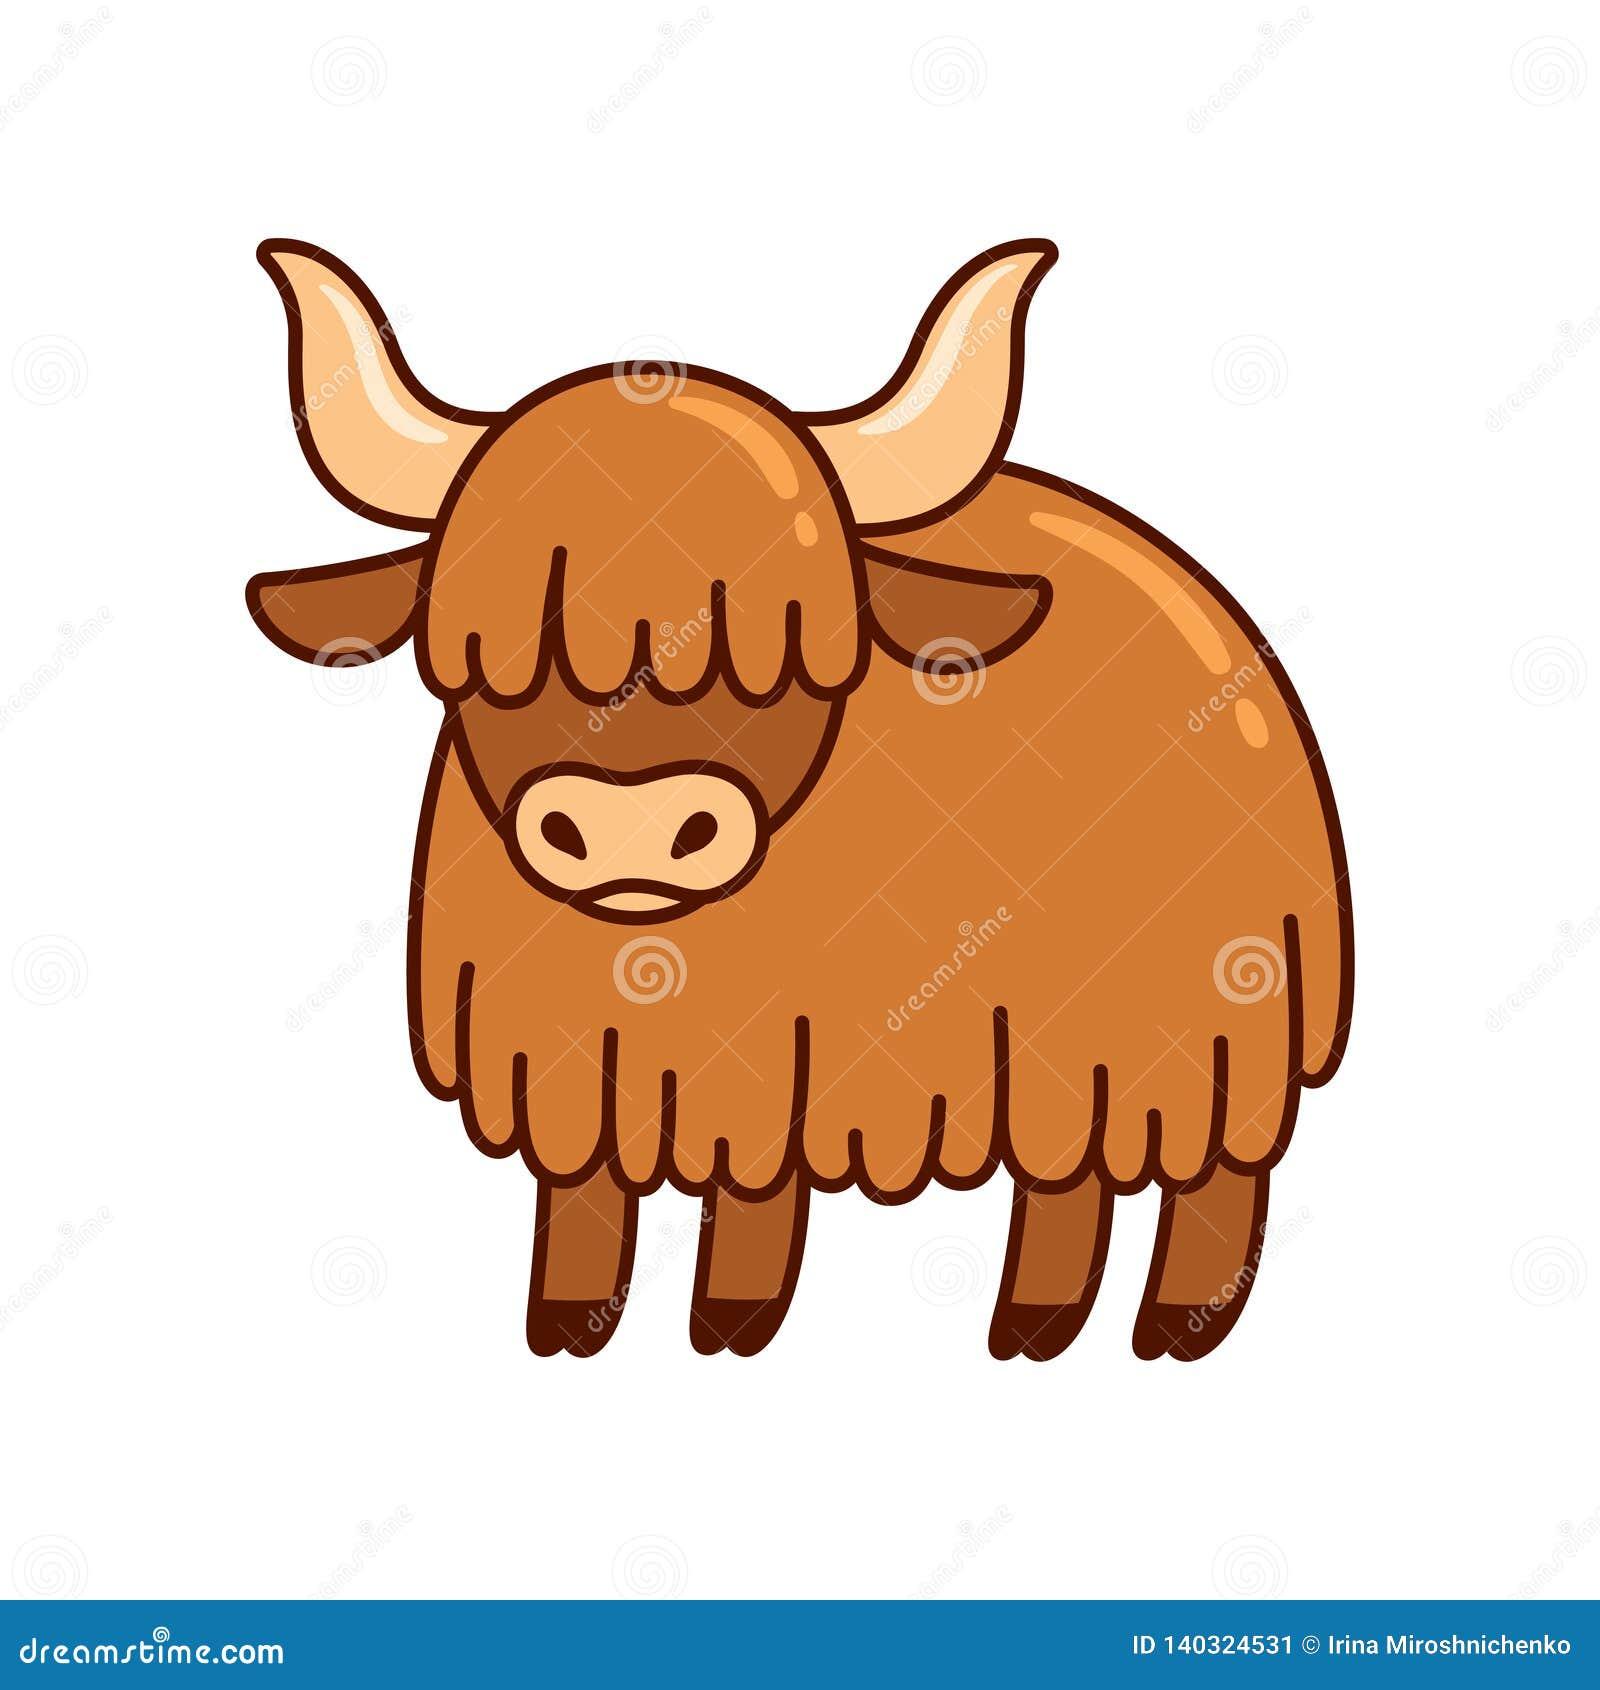 vector cartoon animal clipart: tibetan yak Stock Vector Image & Art - Alamy